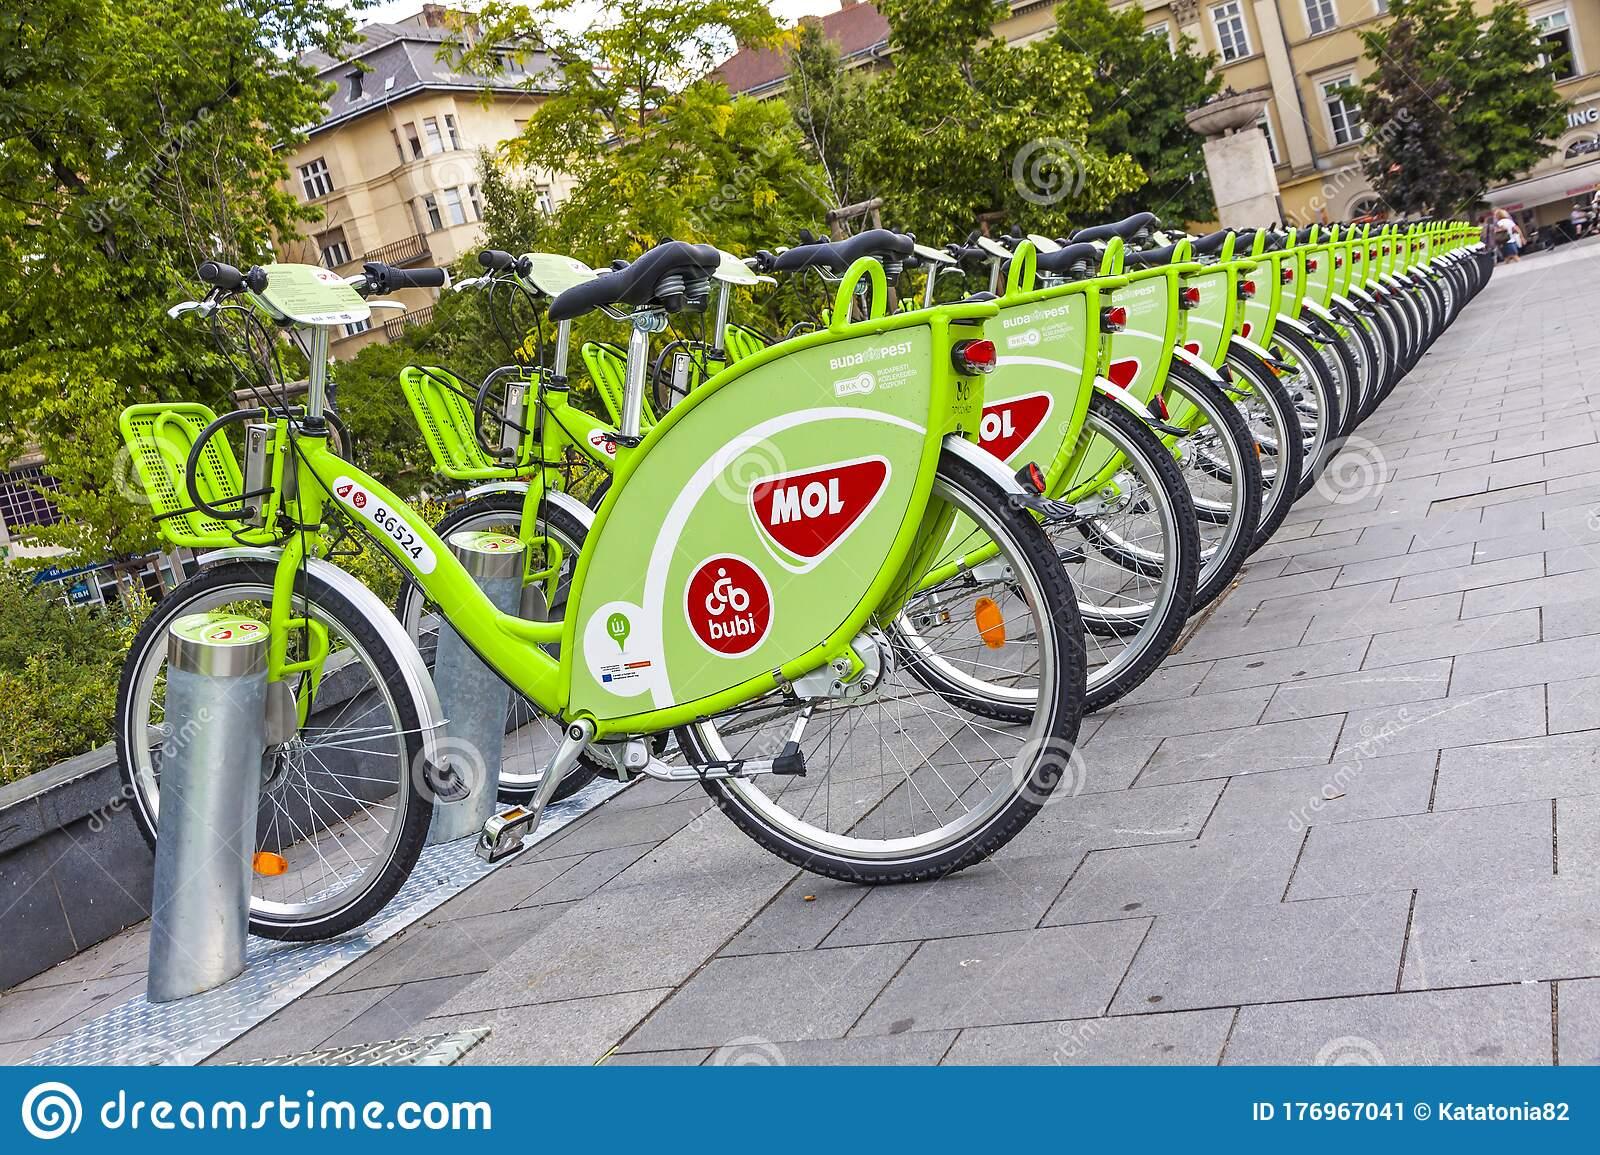 Bubi bikes - public bike system in Budapest